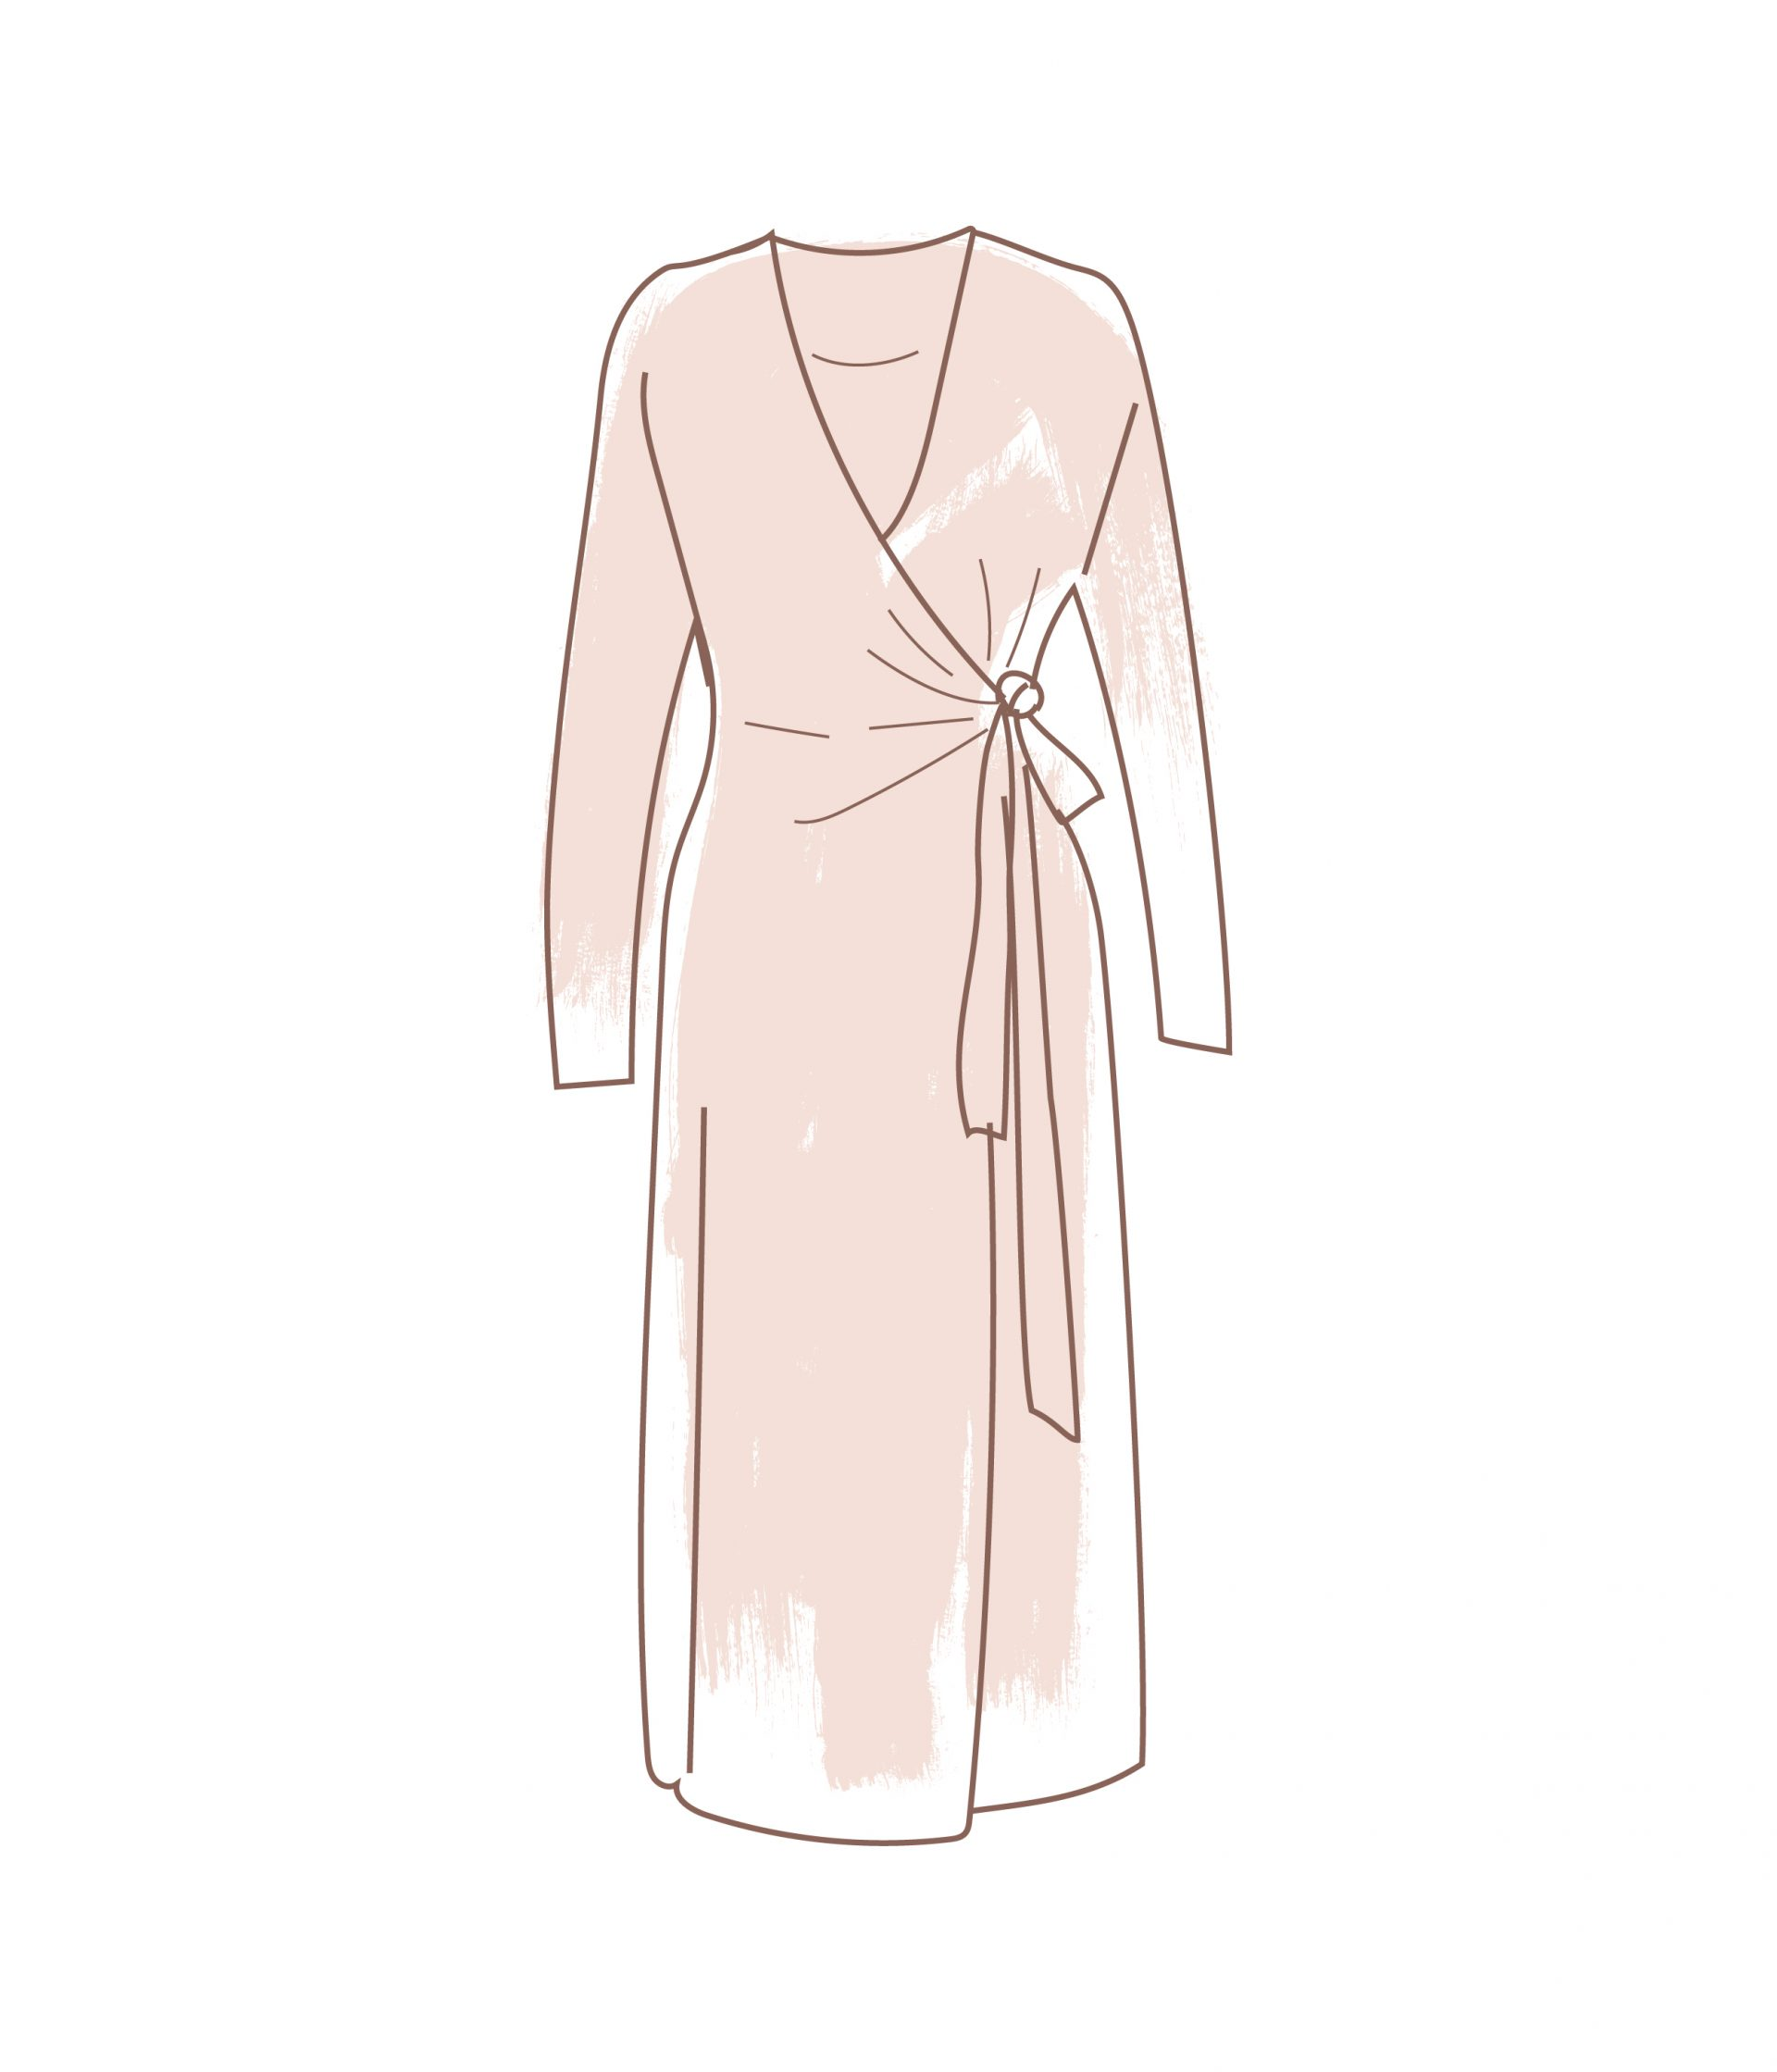 La robe portefeuille